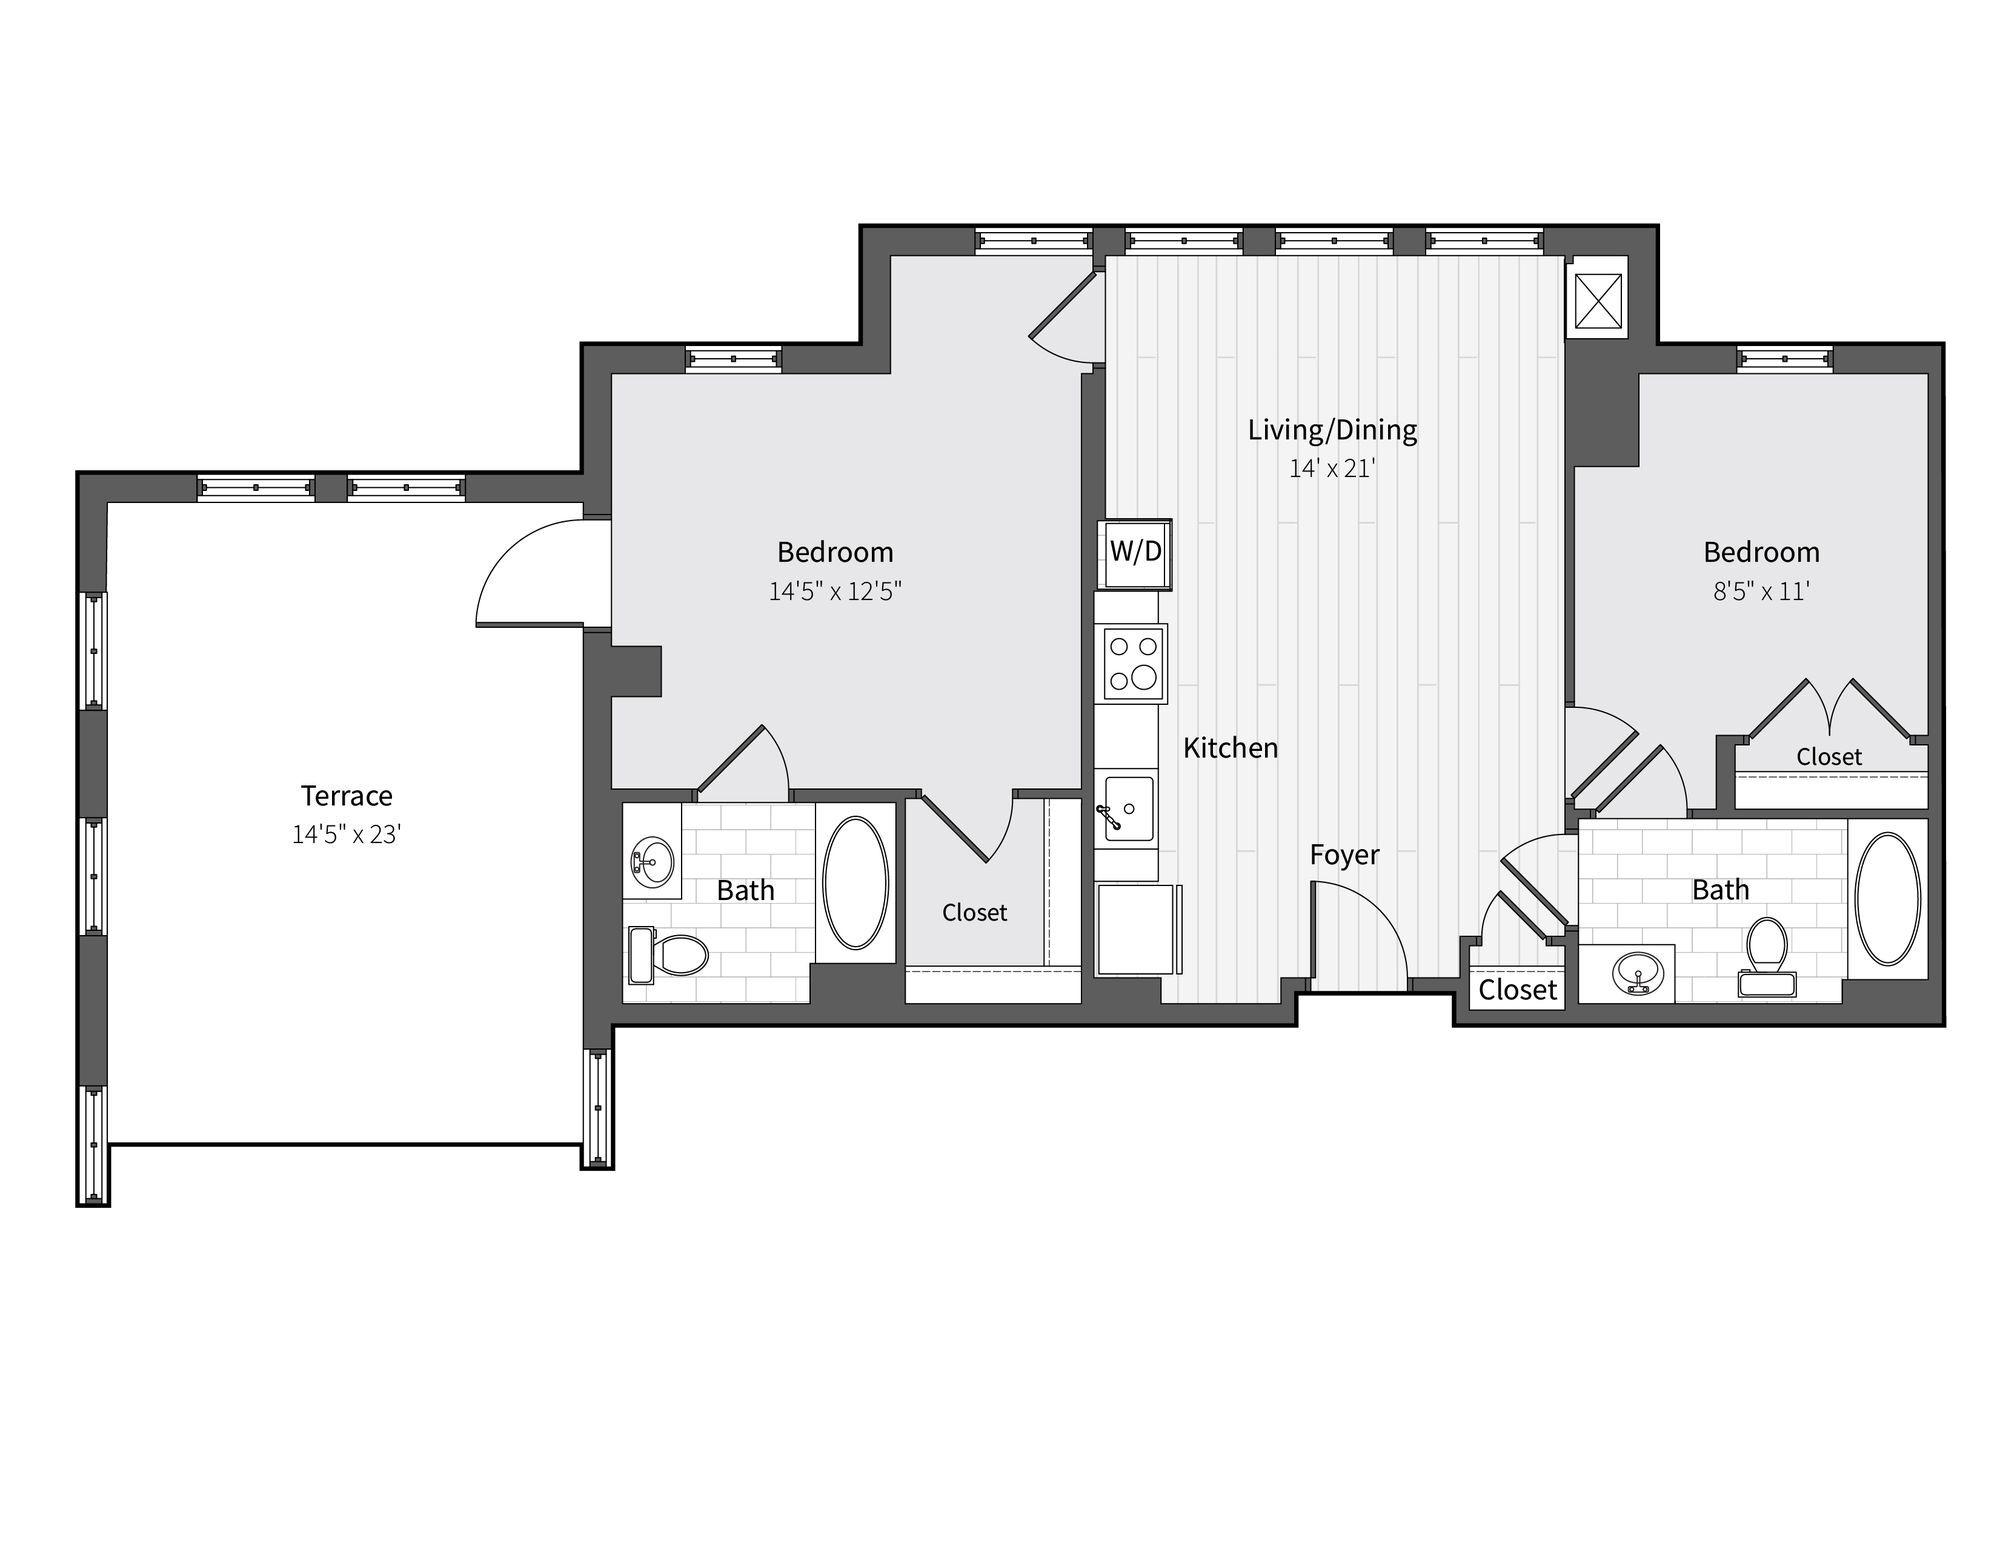 Apartment 729 floorplan